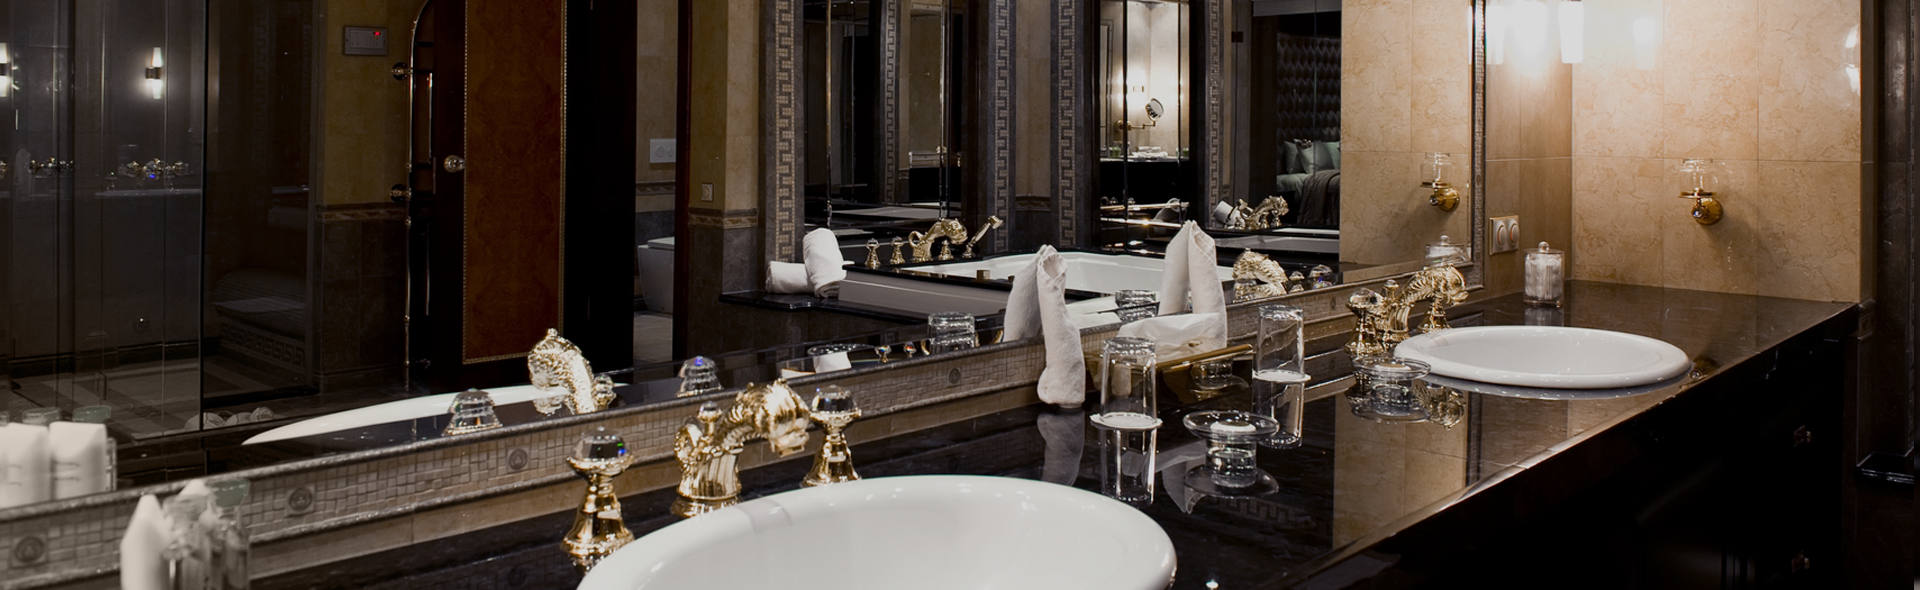 Luxury! VIP To Go restroom trailers offer amazing luxury.